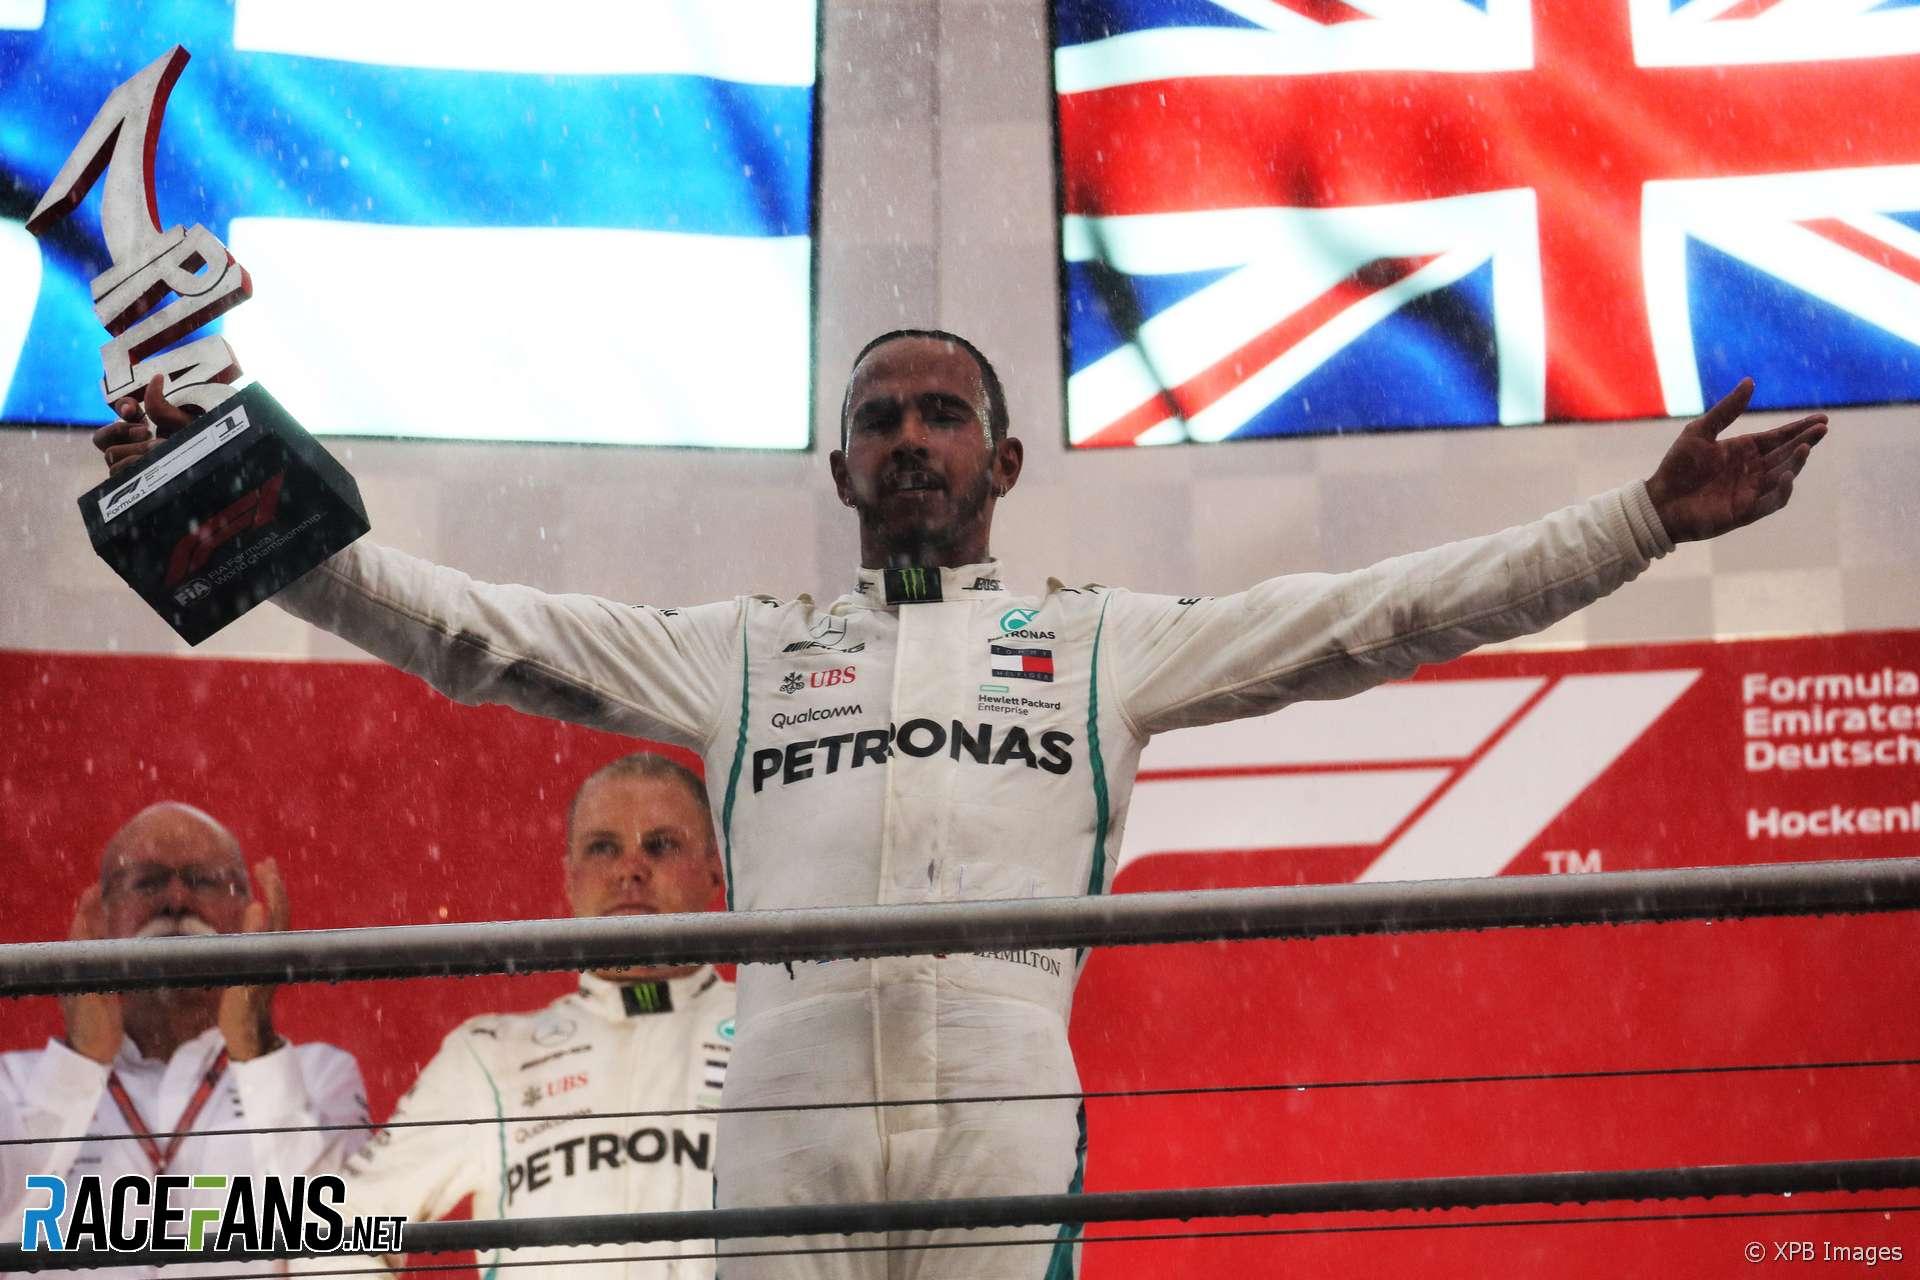 Lewis Hamilton, Mercedes, Hockenheimring, 2018